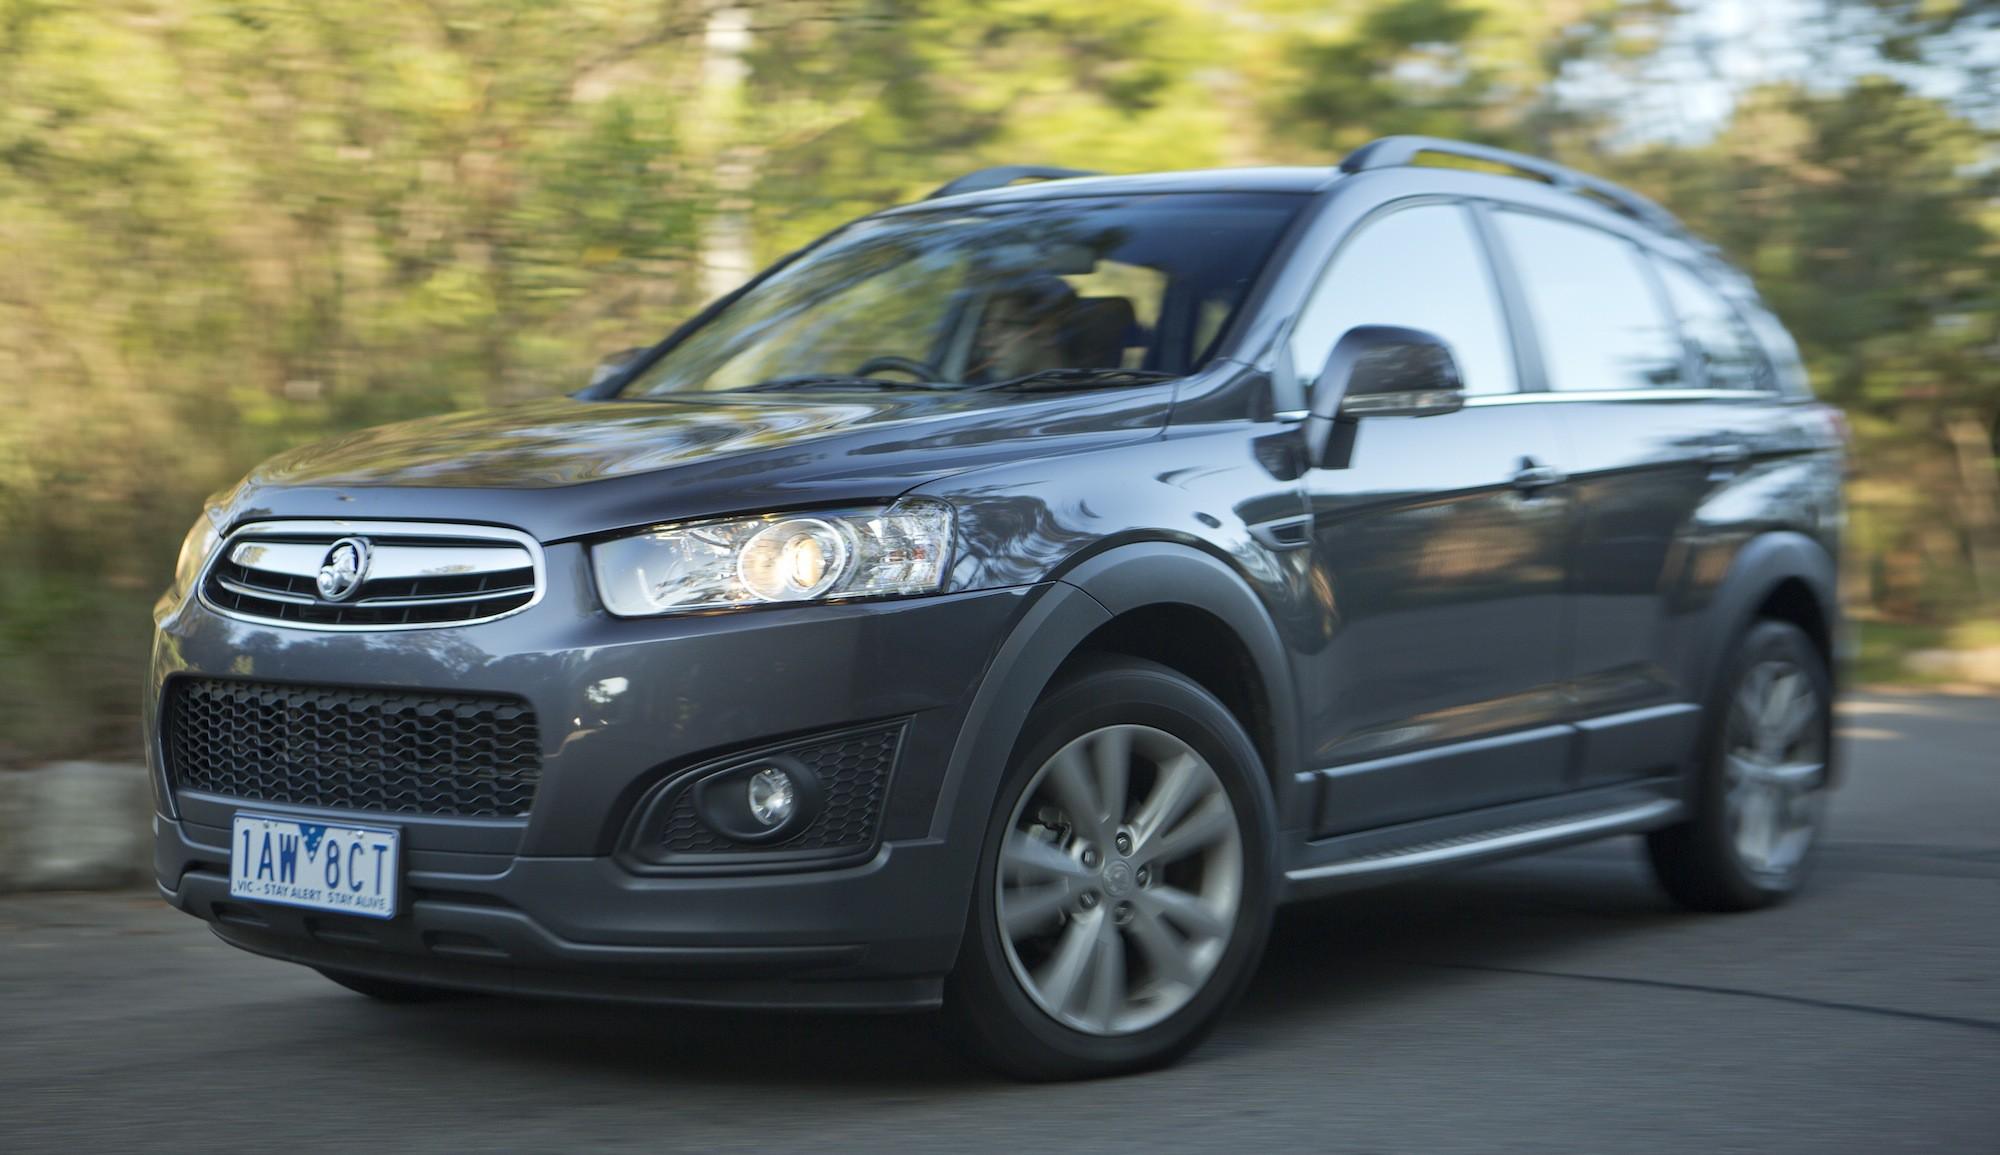 2014 Holden Captiva 7 Review: LT 3.0-litre V6 petrol ...